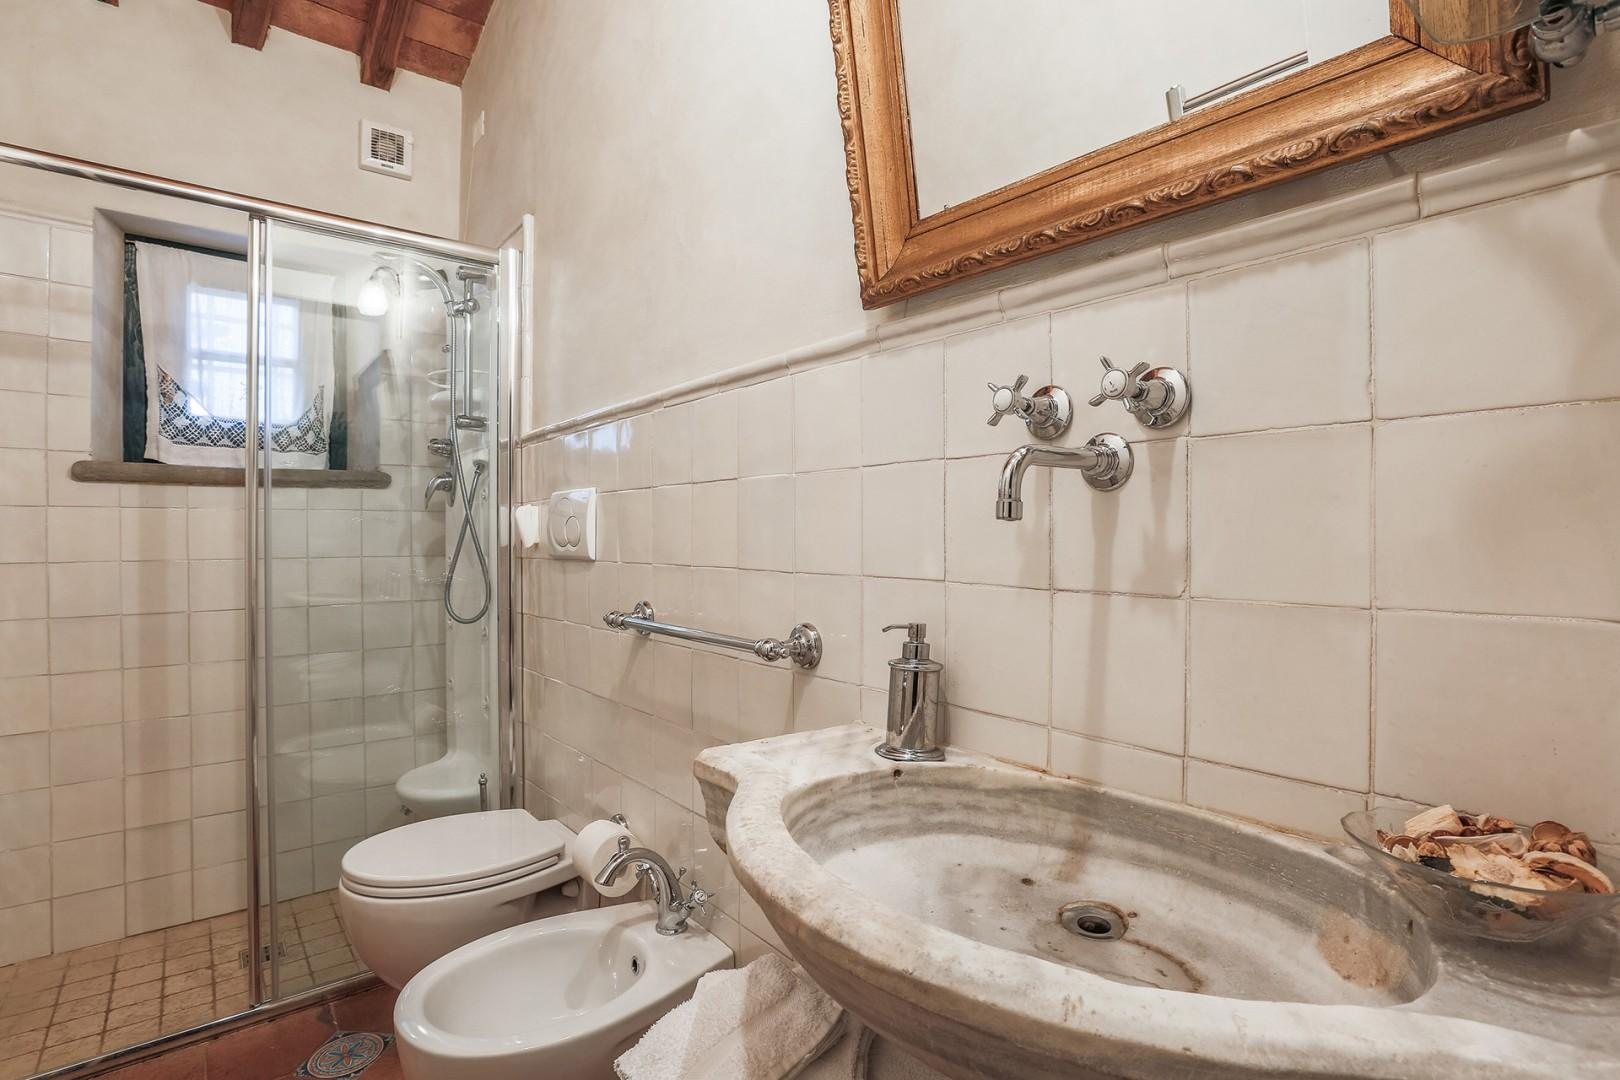 First floor bathroom 3 has large shower.